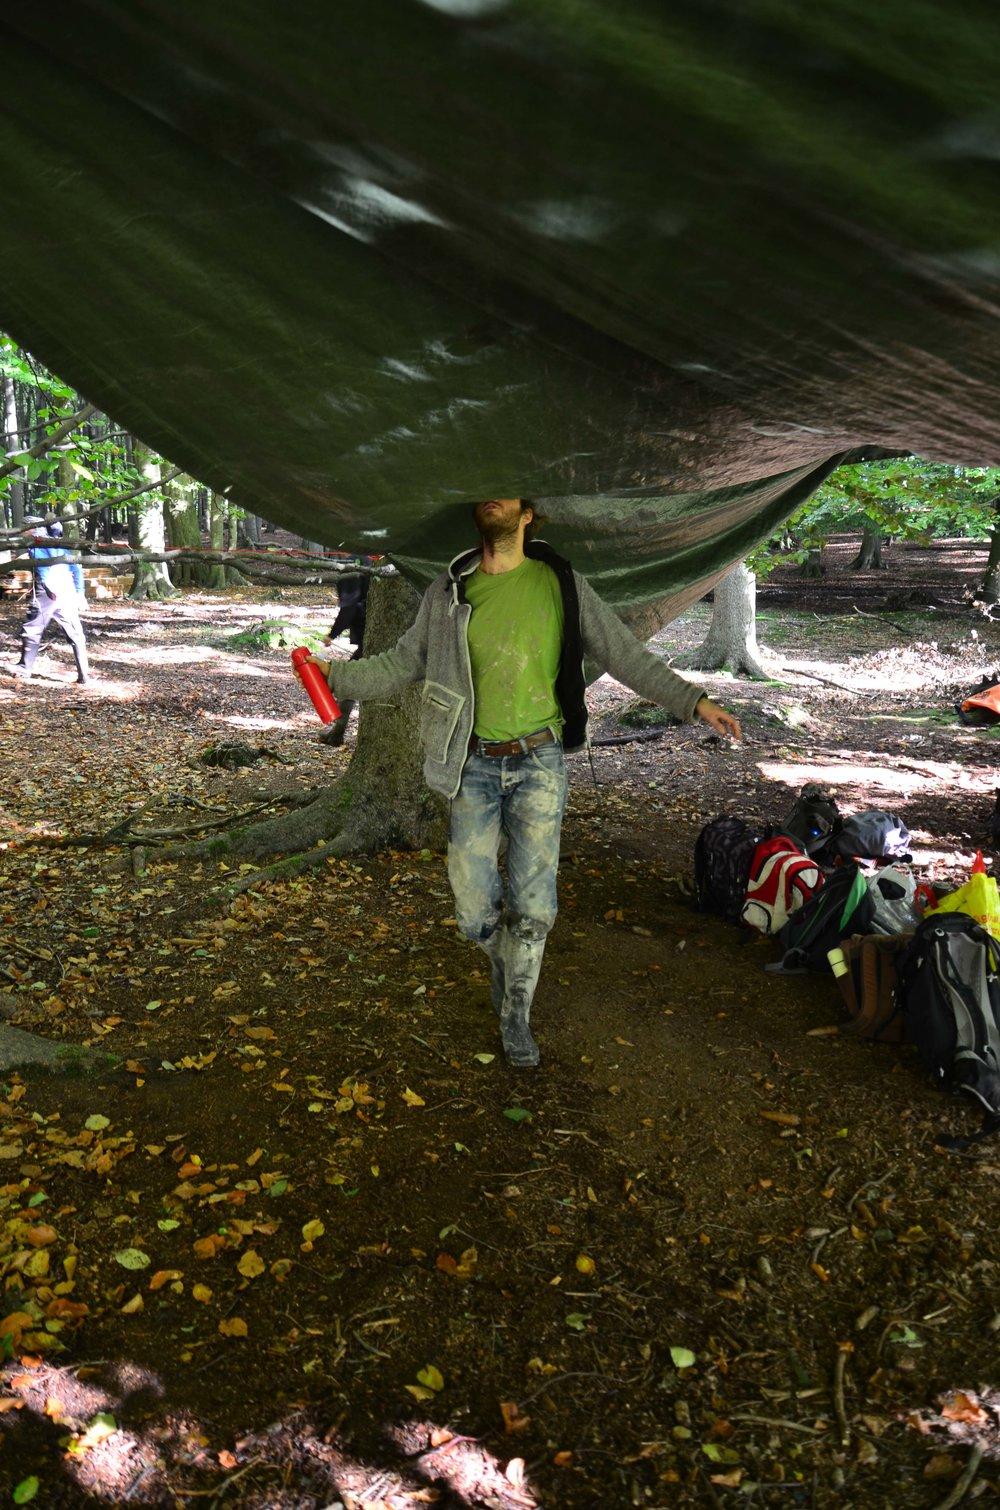 Bergwaldprojekt_Sassnitz_Ruegen_Moor_150dpi_20171014_Credits_CC-BY-SA_Jenni_Ottilie_Keppler-29.jpg